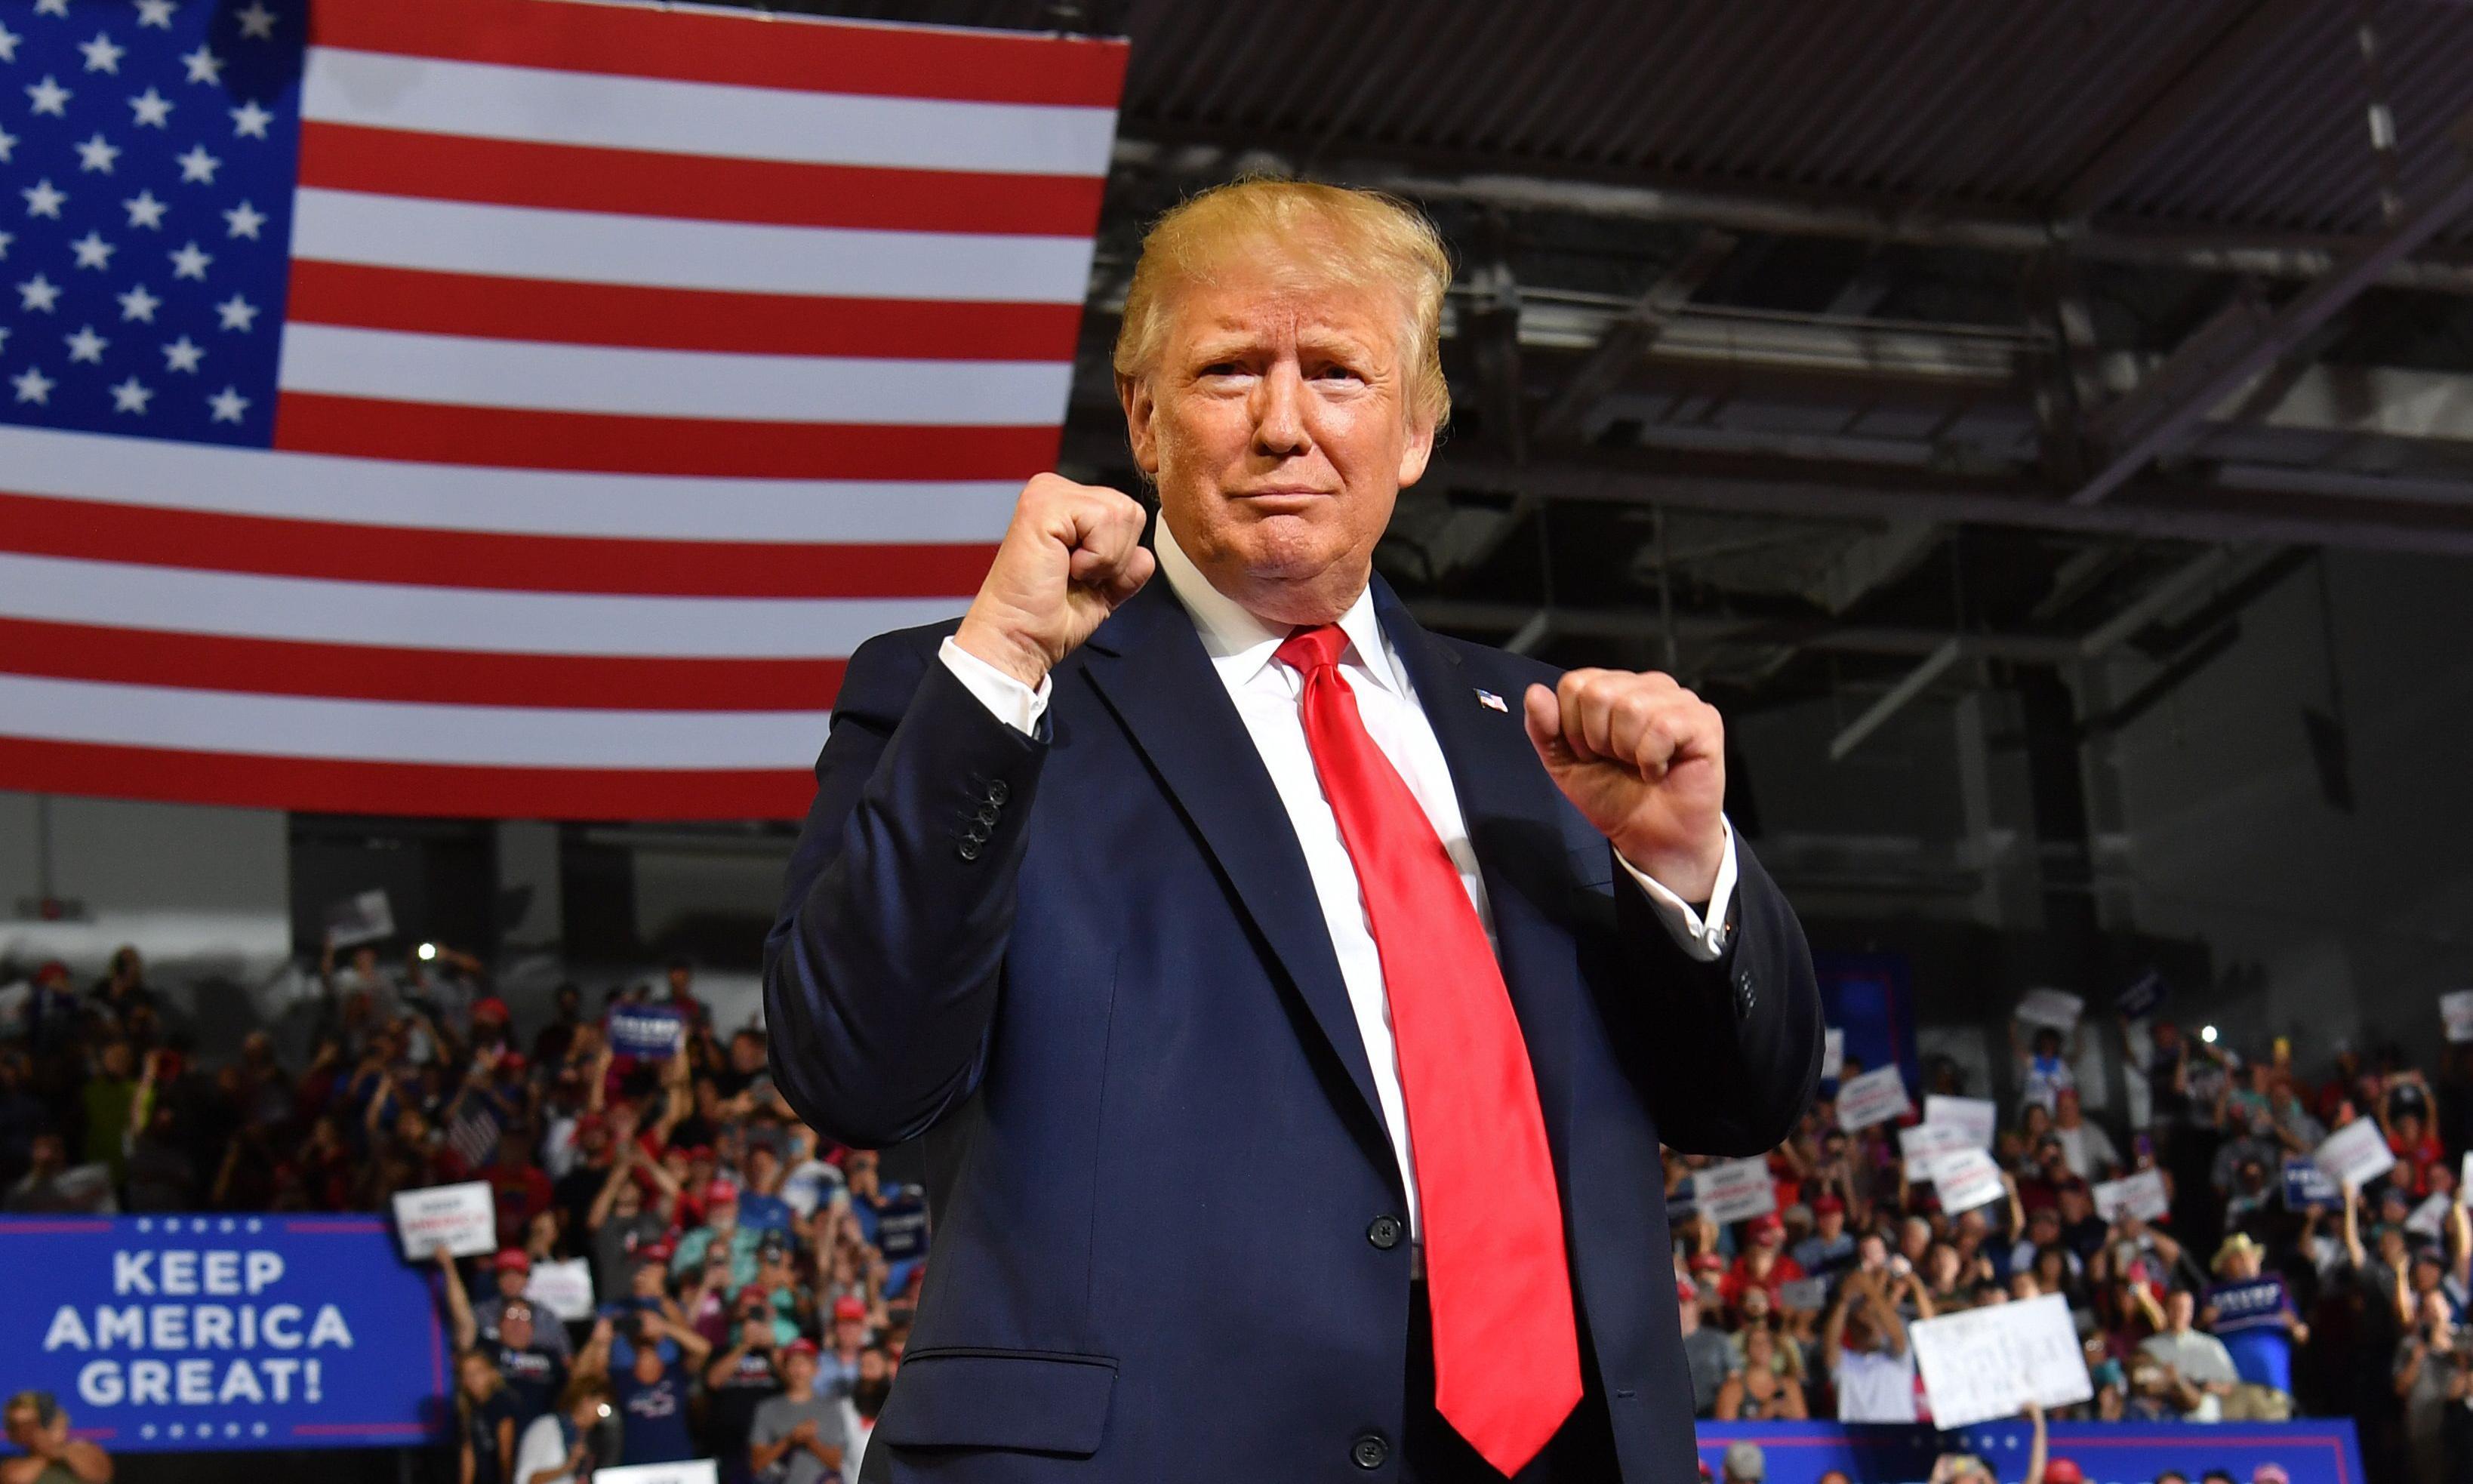 The Man Who Sold America: Joy-Ann Reid hosts a Trump house of horrors